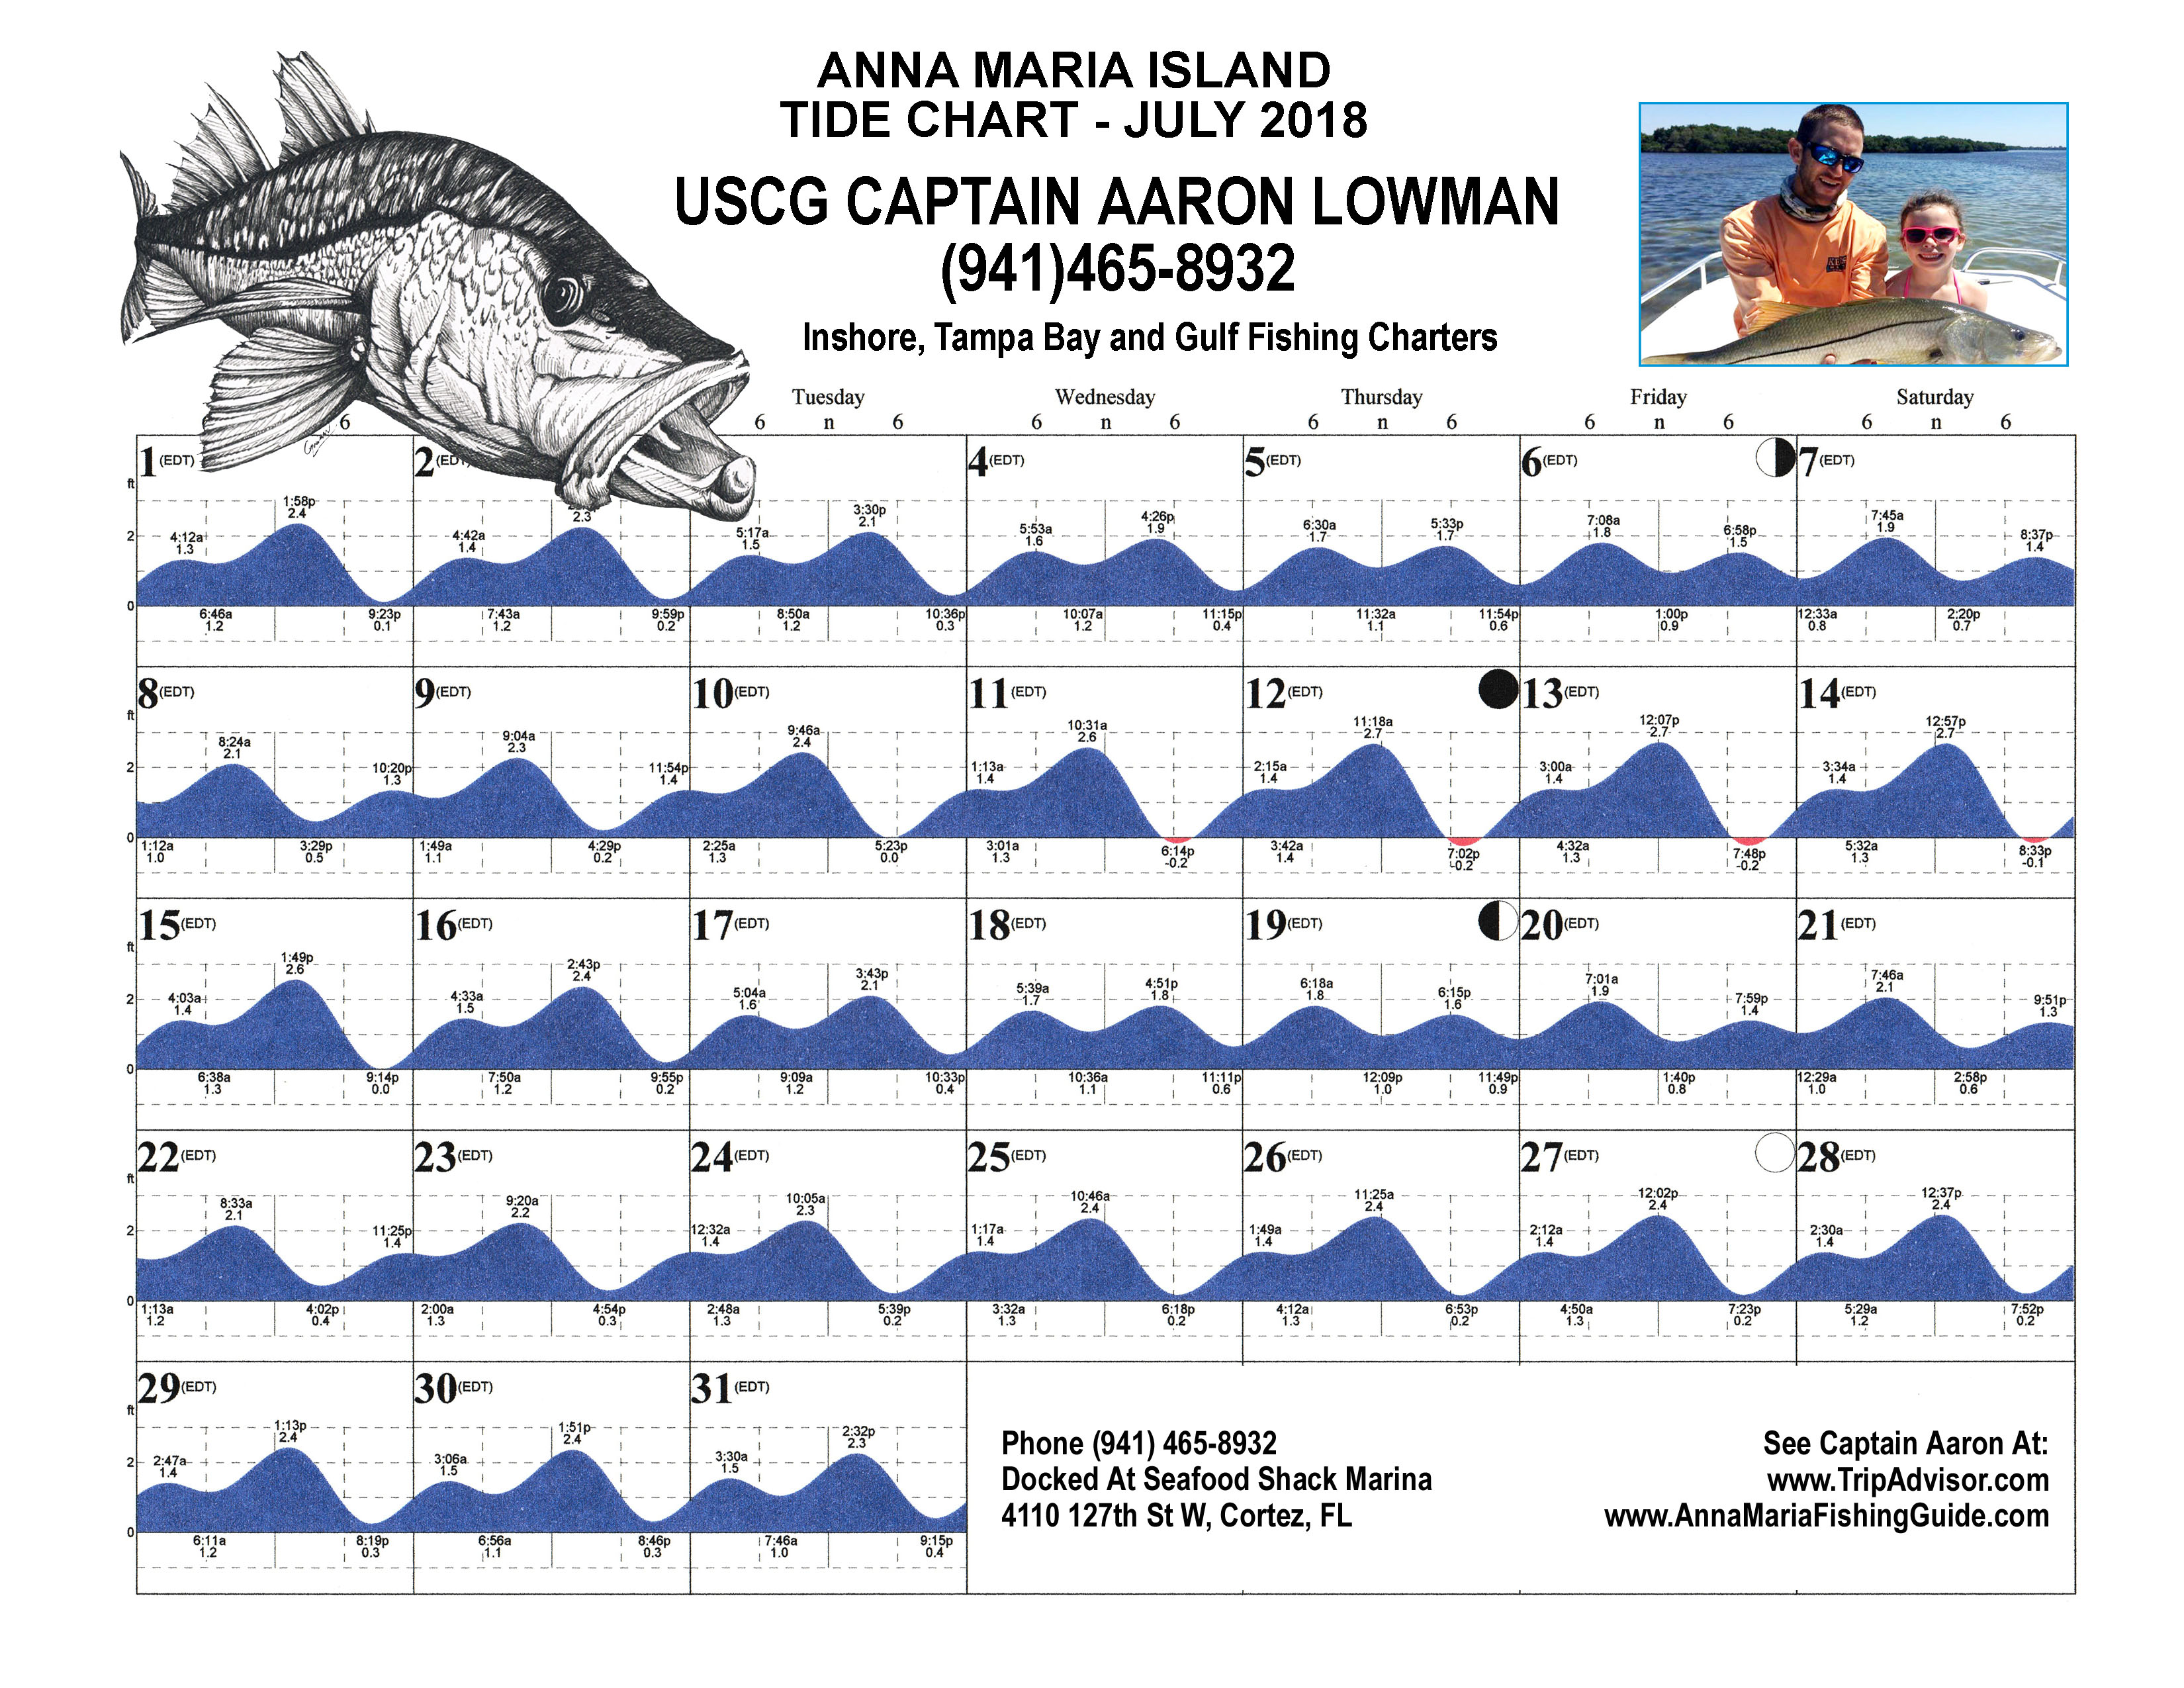 Anna Maria Island Tides Captain Aaron Lowman